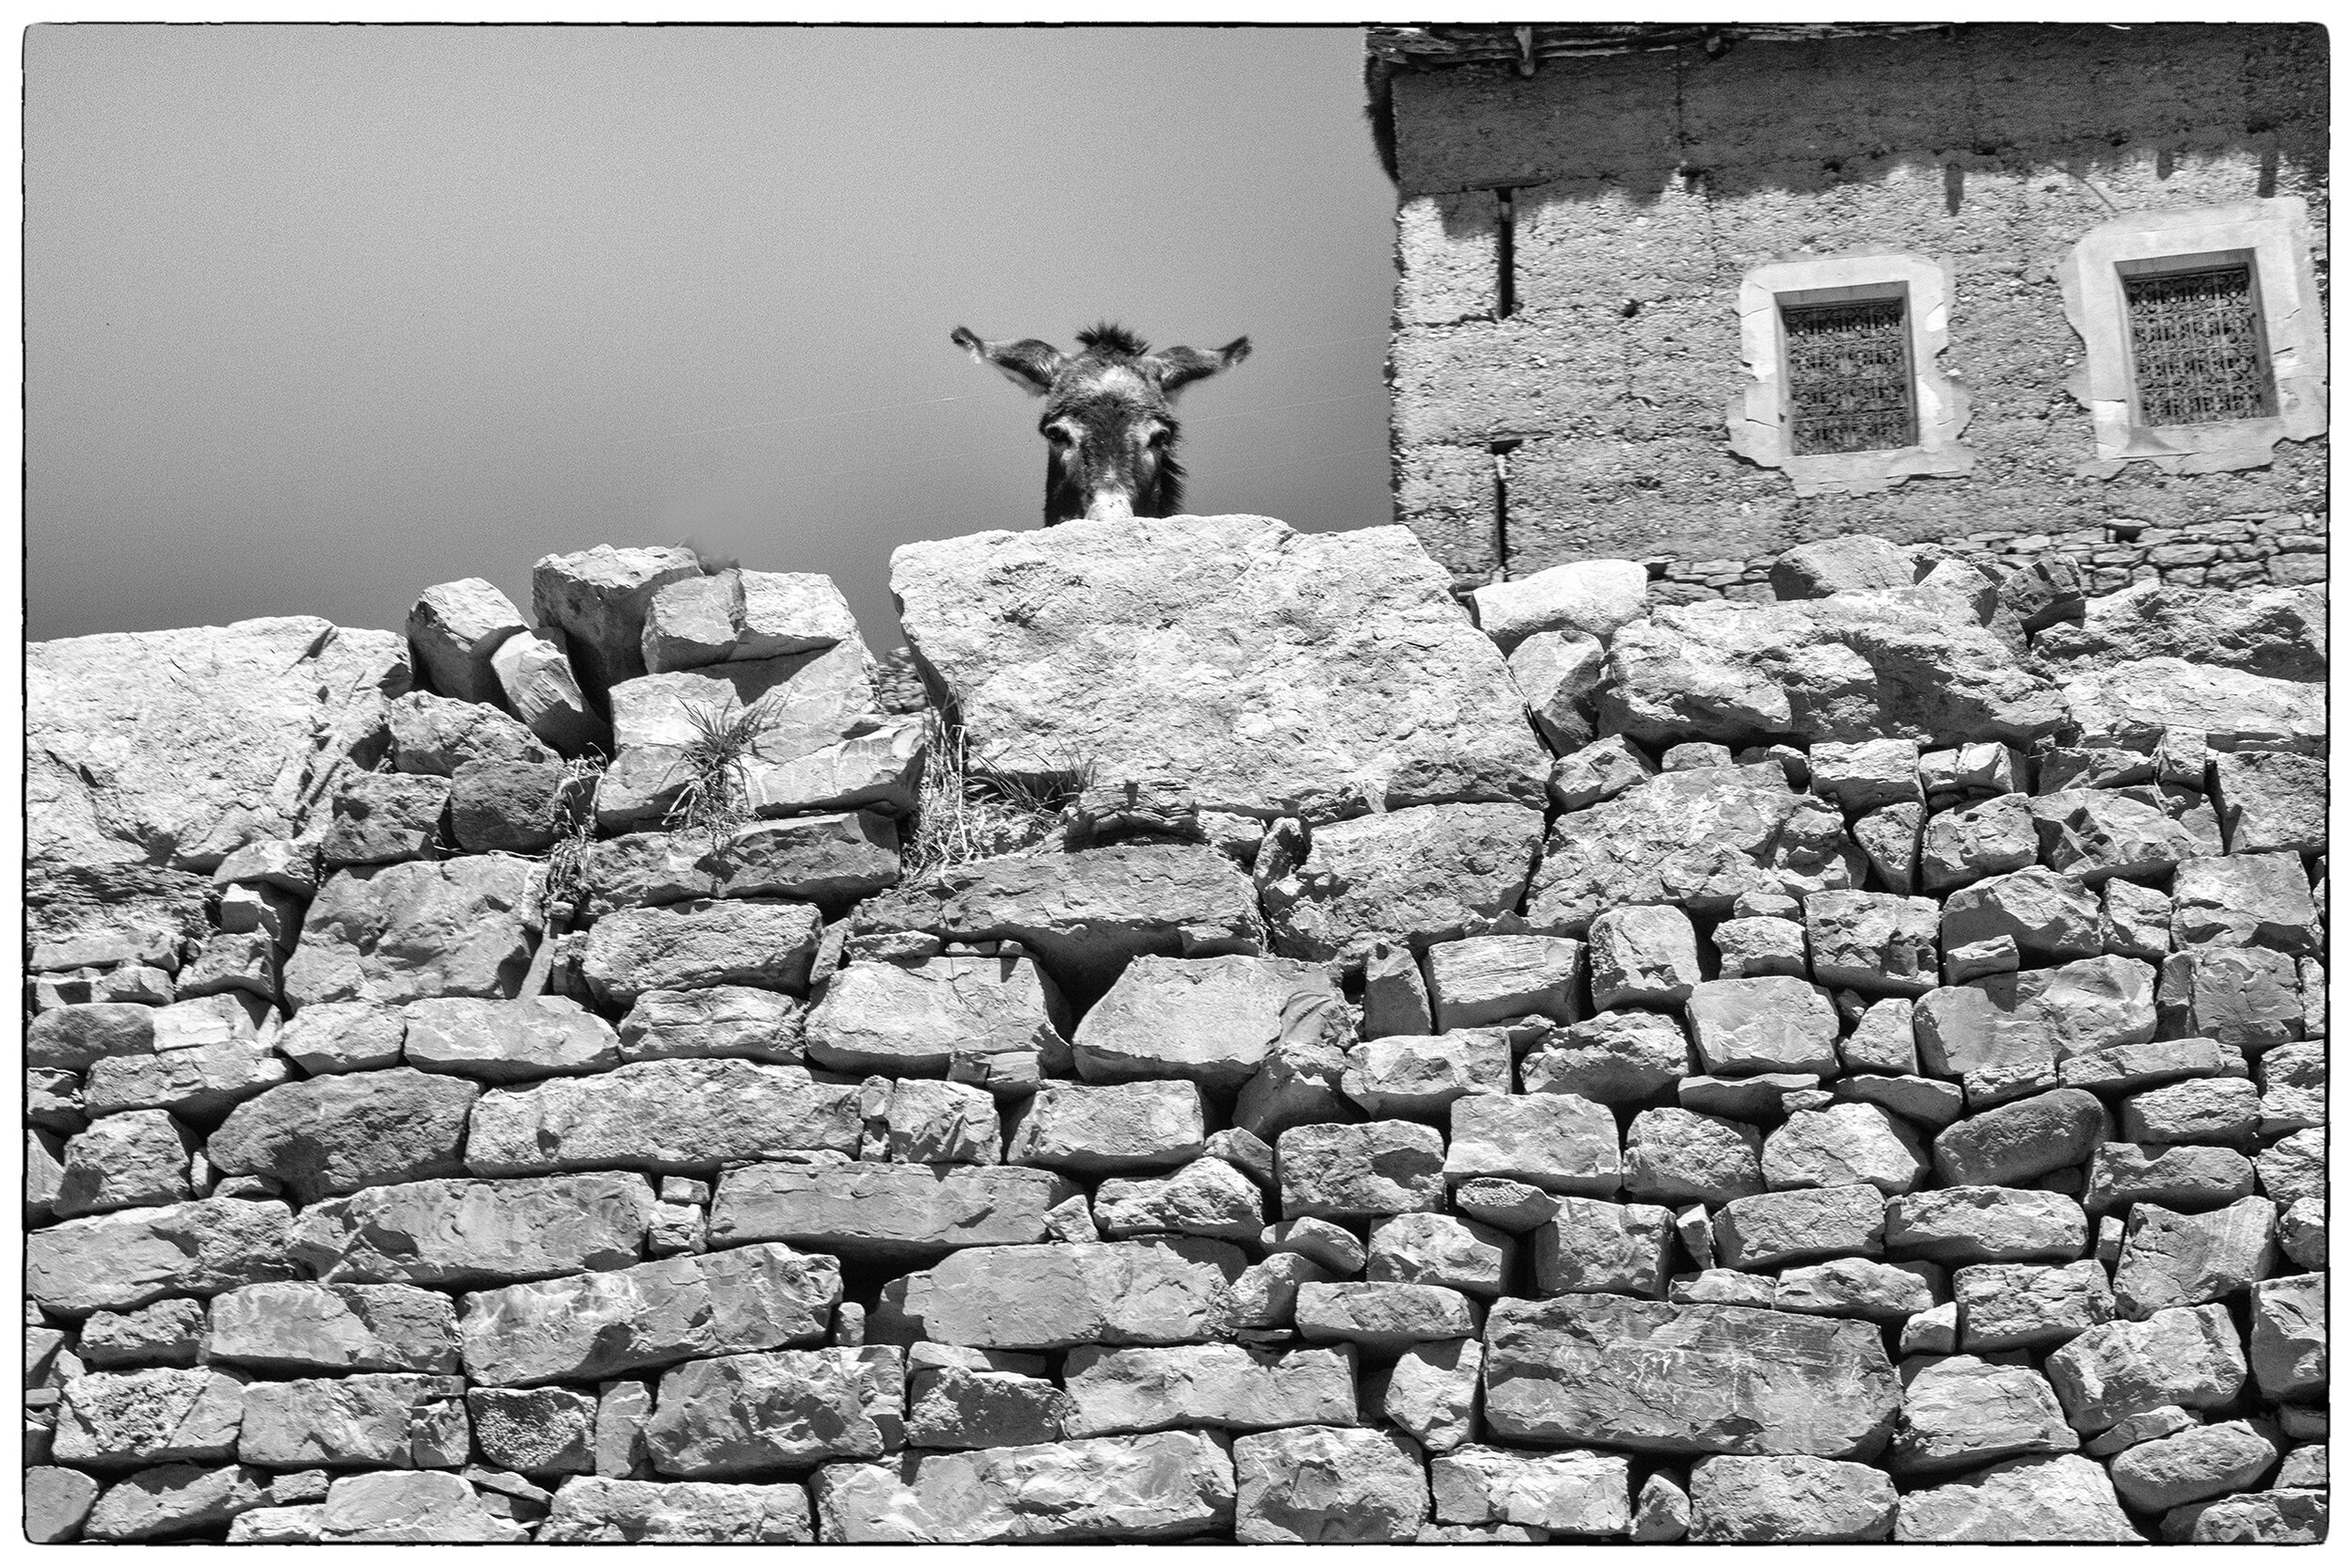 Donkey and stone wall (web).jpg